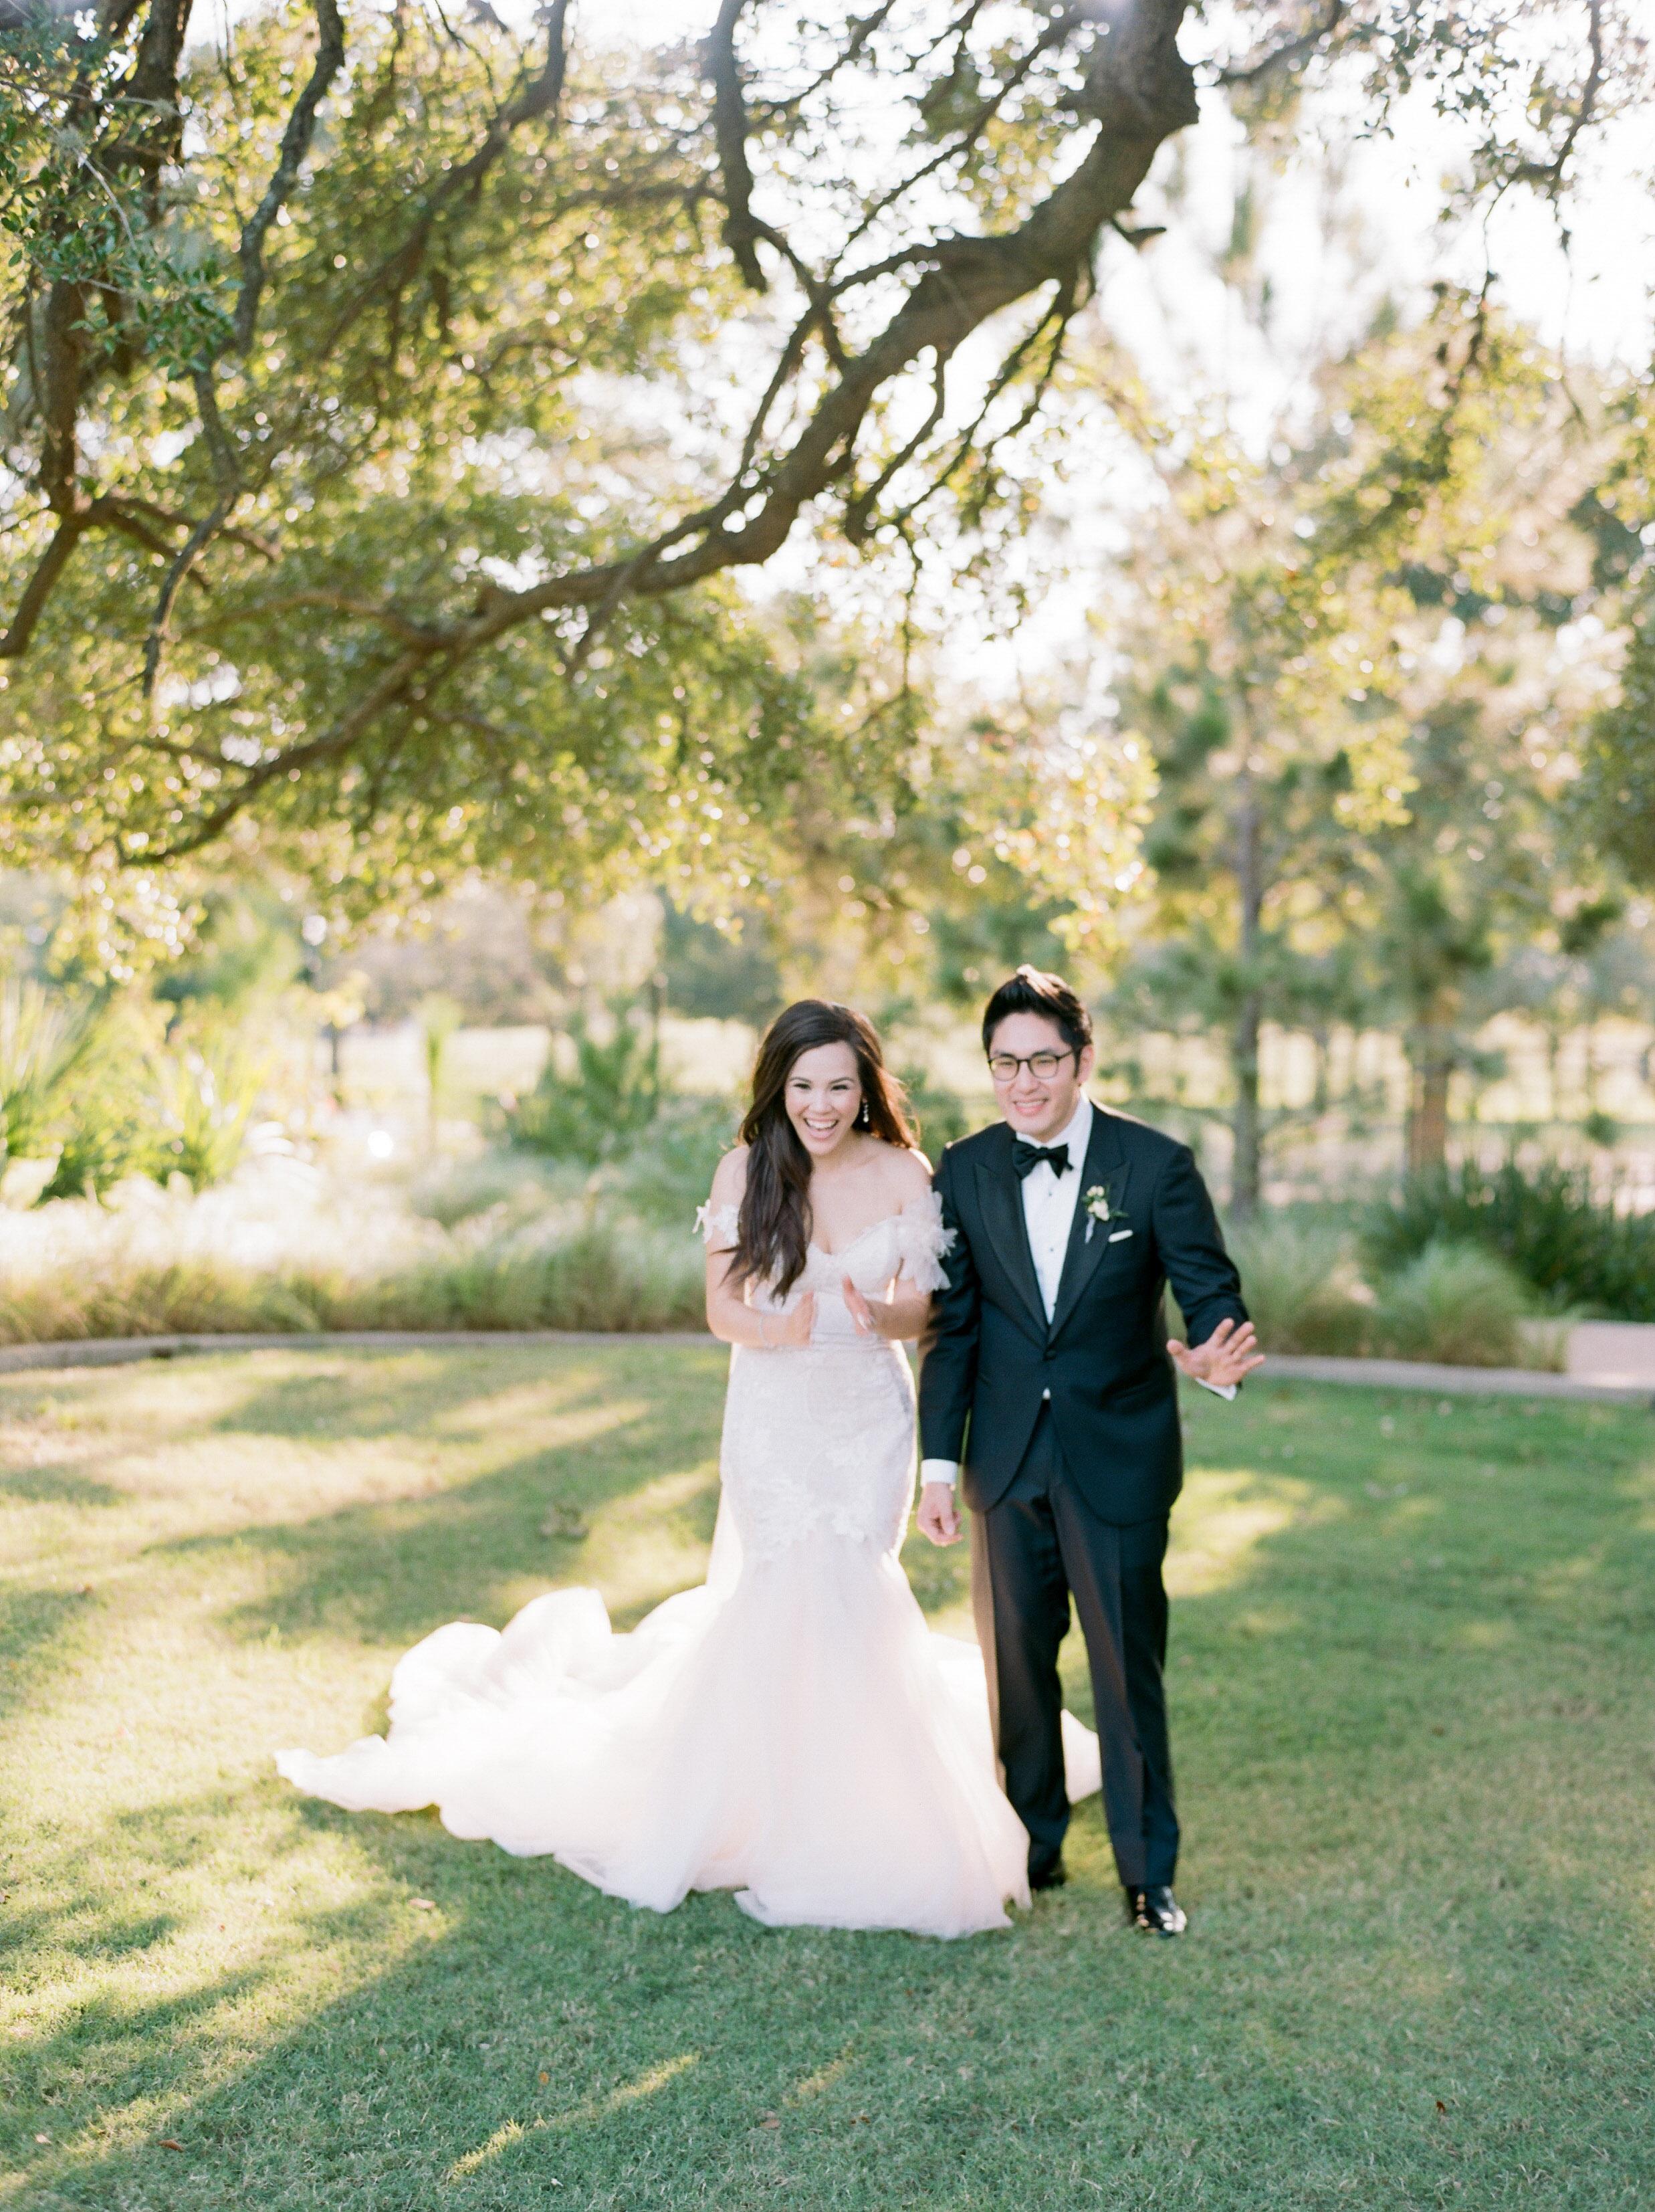 Martha-Stewart-Wedding-Dana-Fernandez-Photography-Josh-Texas-Film-Houston-Wedding-Fine-Art-Photographer-McGovern-Centennial-Gardens-Top-Best-60.jpg